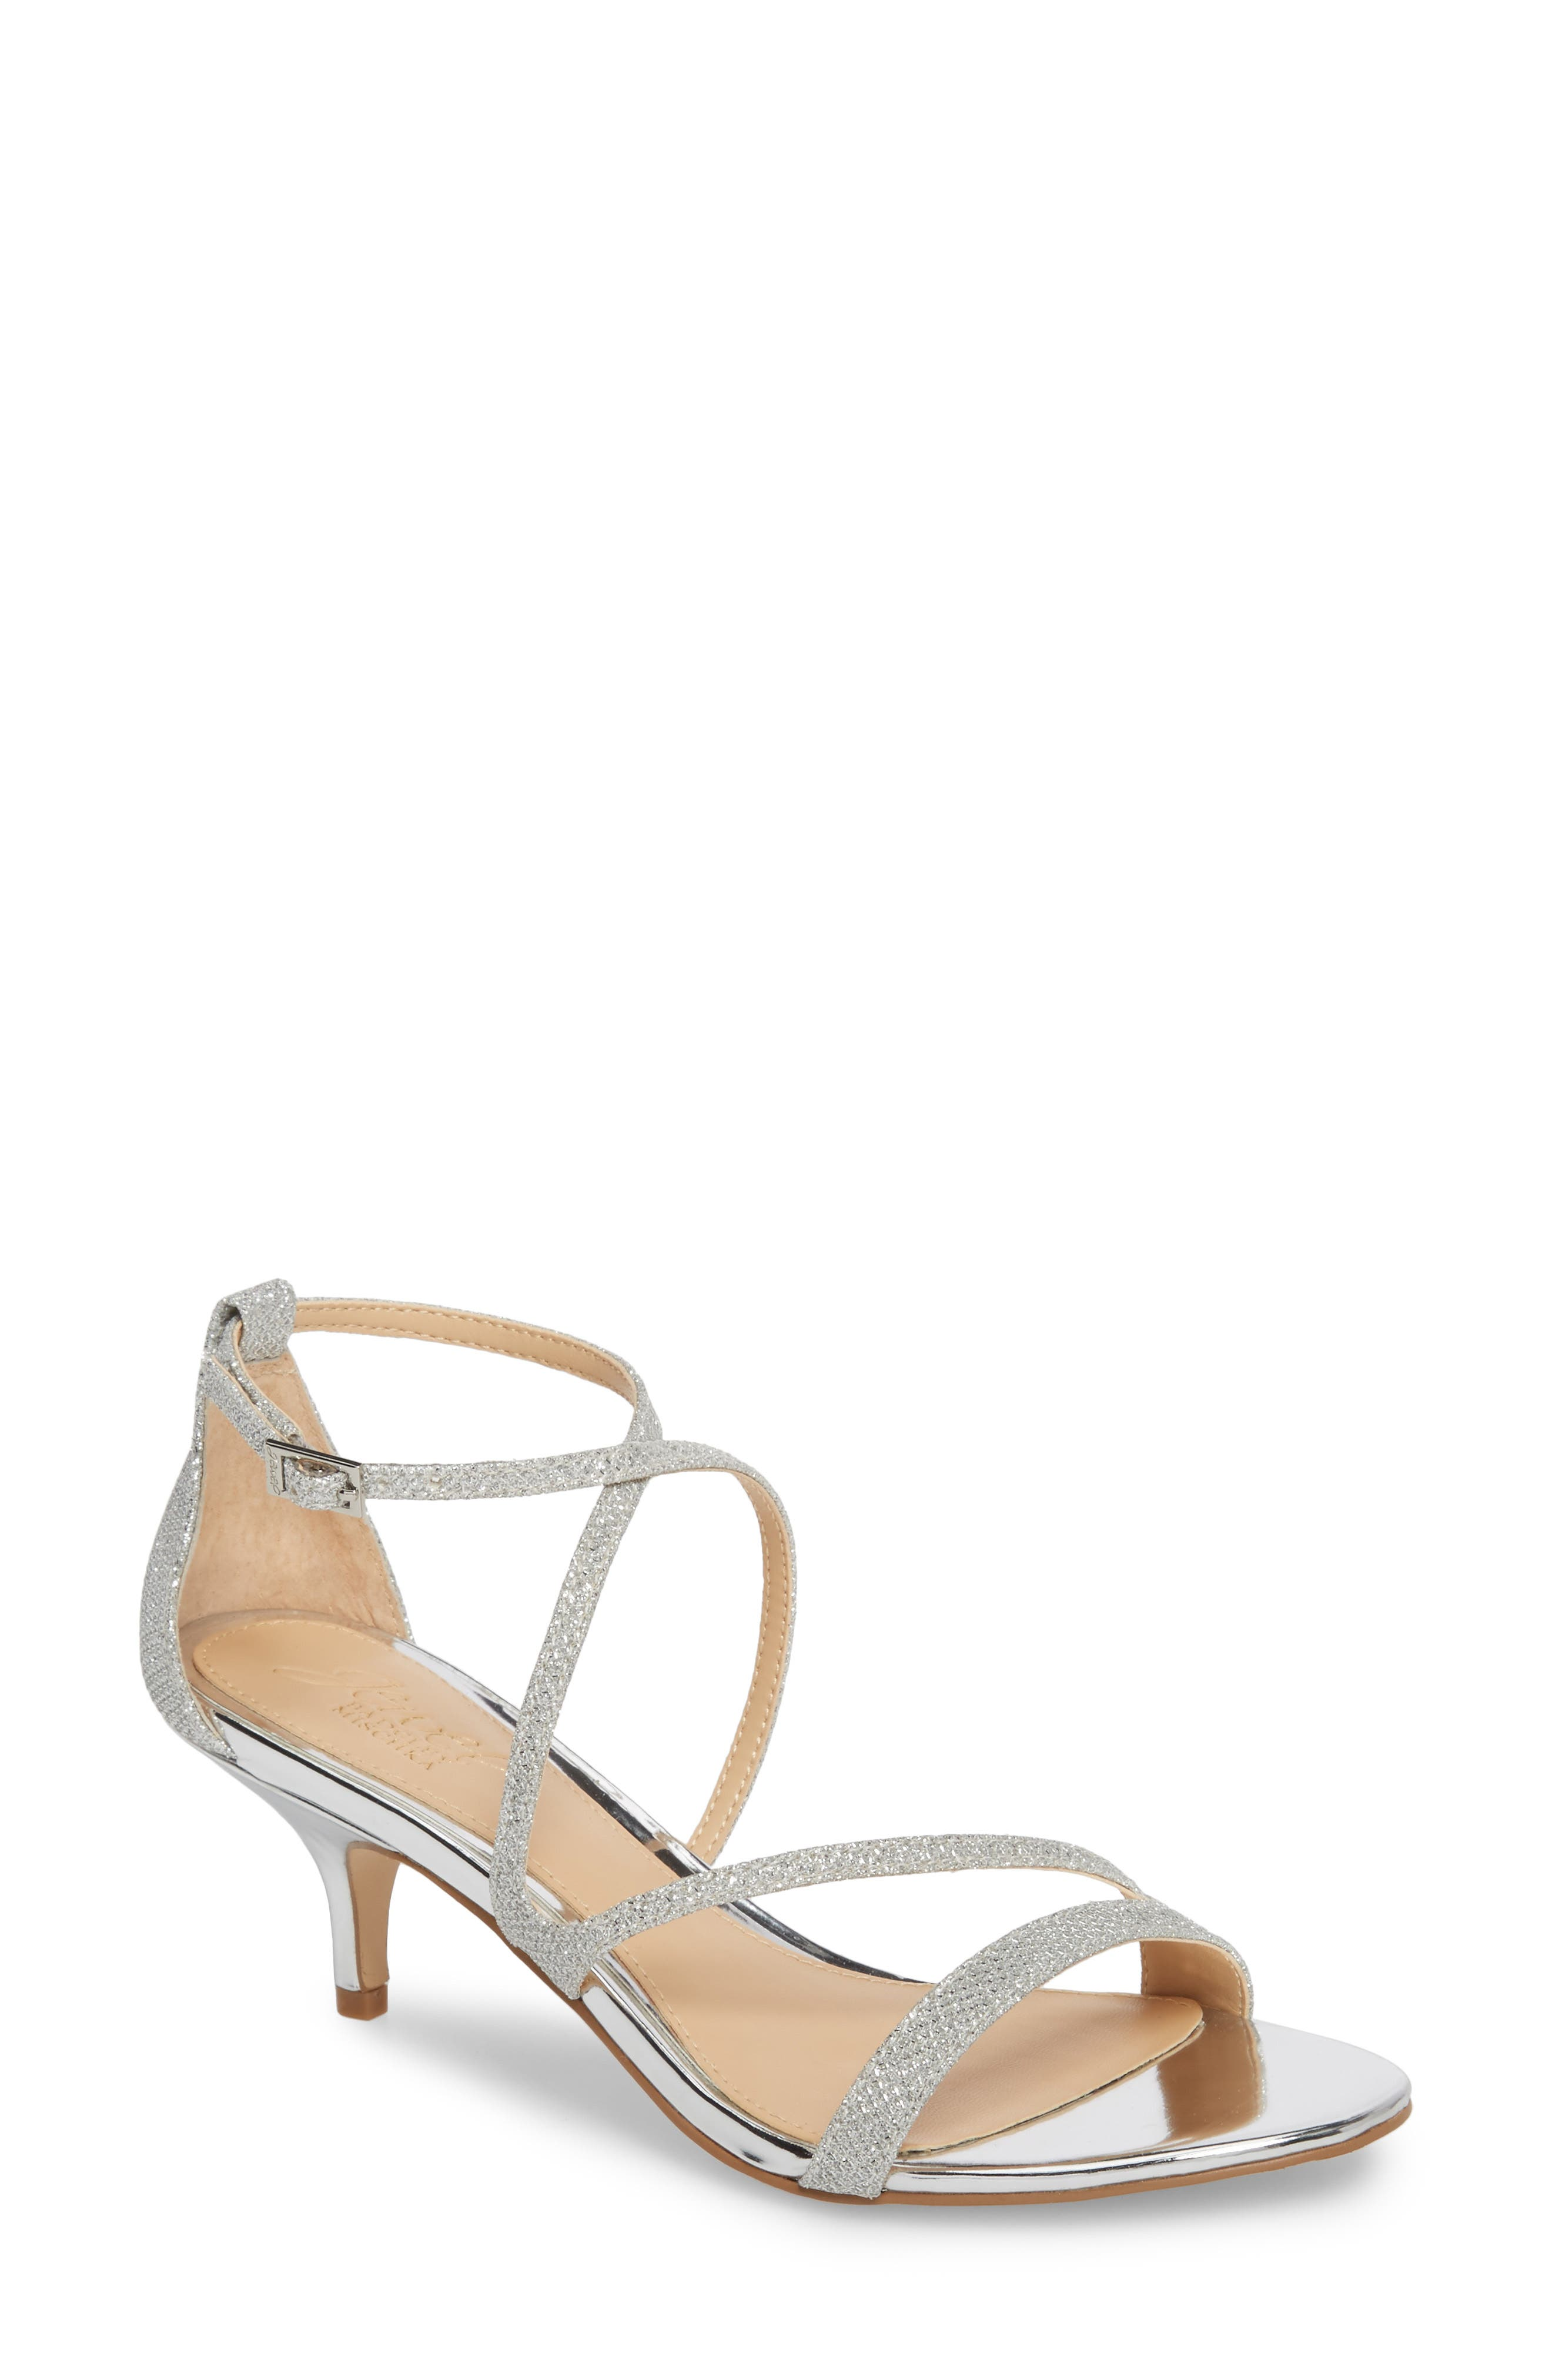 Jewel Badgley Mischka Gal Glitter Kitten Heel Sandal (Women)